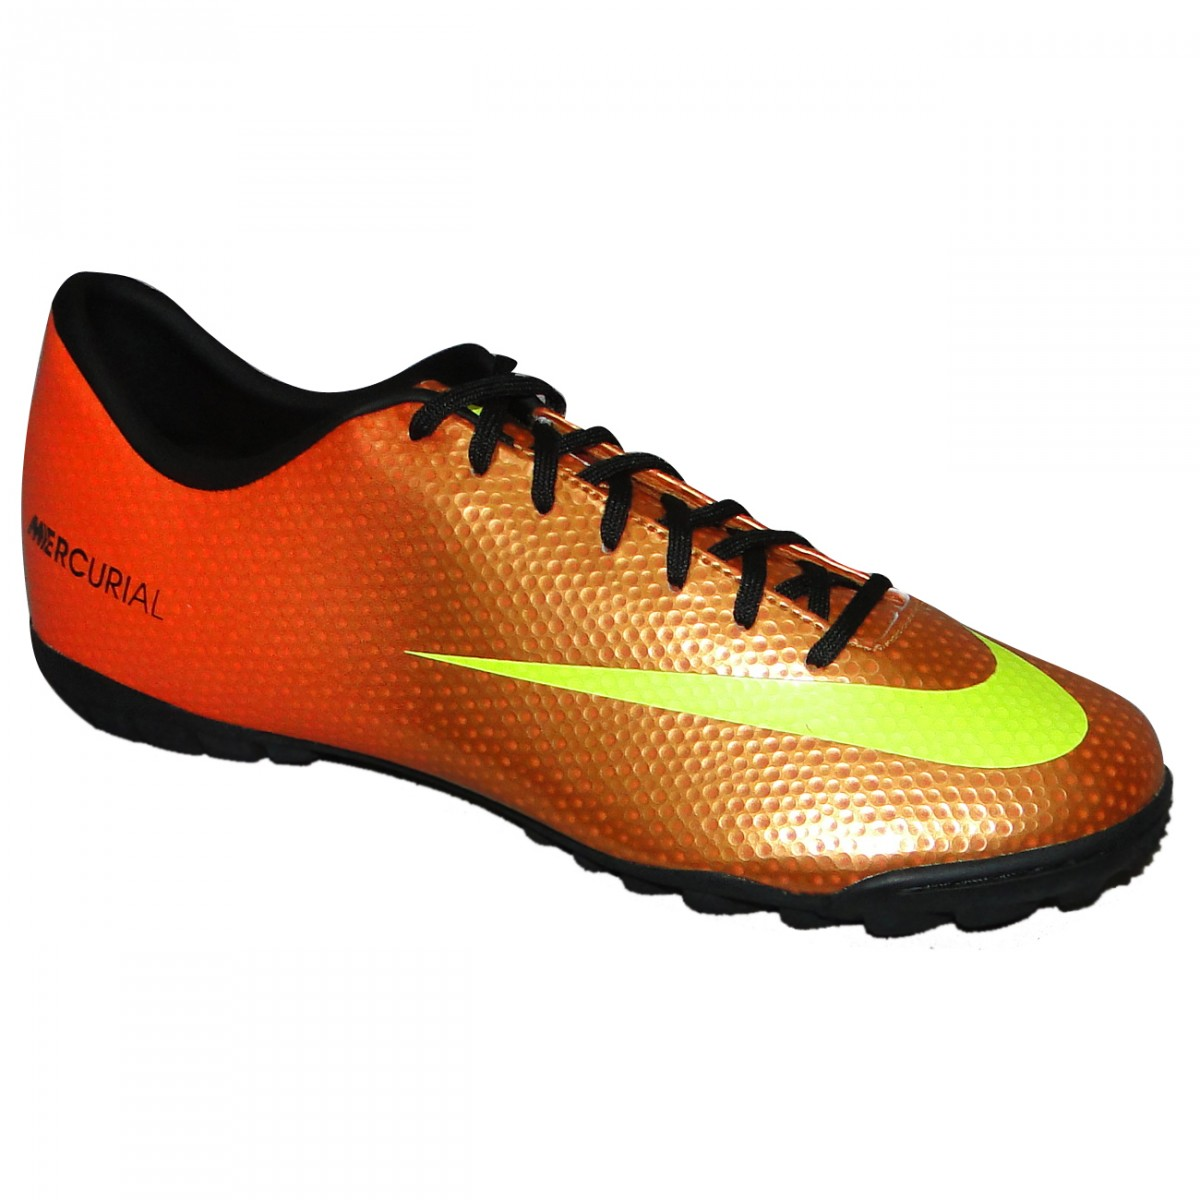 90b8d597c0699 Chuteira Society Nike Mercurial Victory IV 558561 700 - Laranja ...